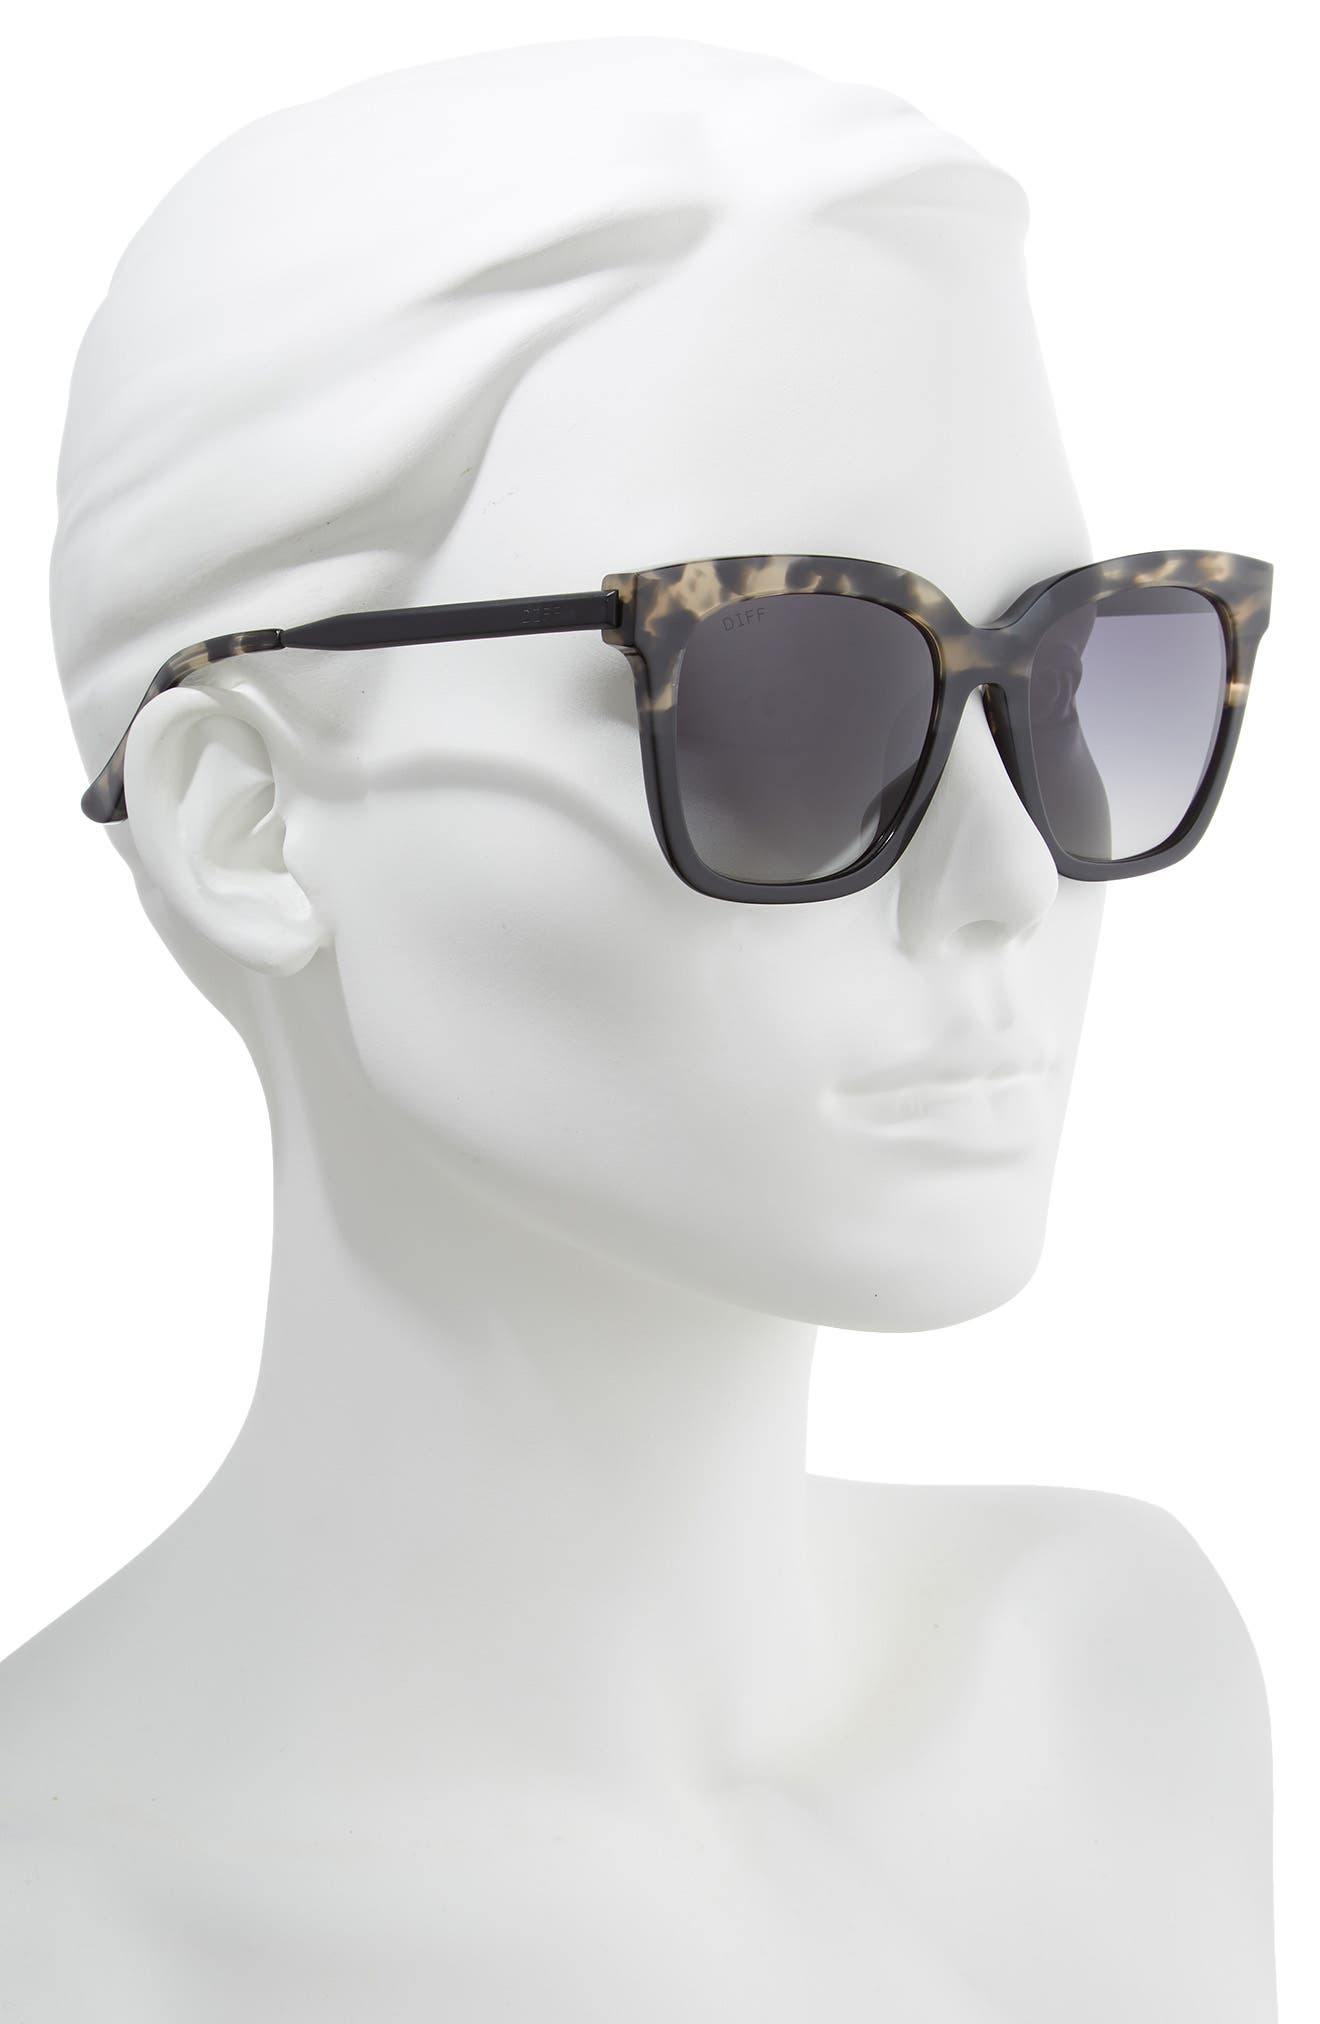 DIFF, Bella 52mm Polarized Sunglasses, Alternate thumbnail 2, color, GREY FAGE/ GREY